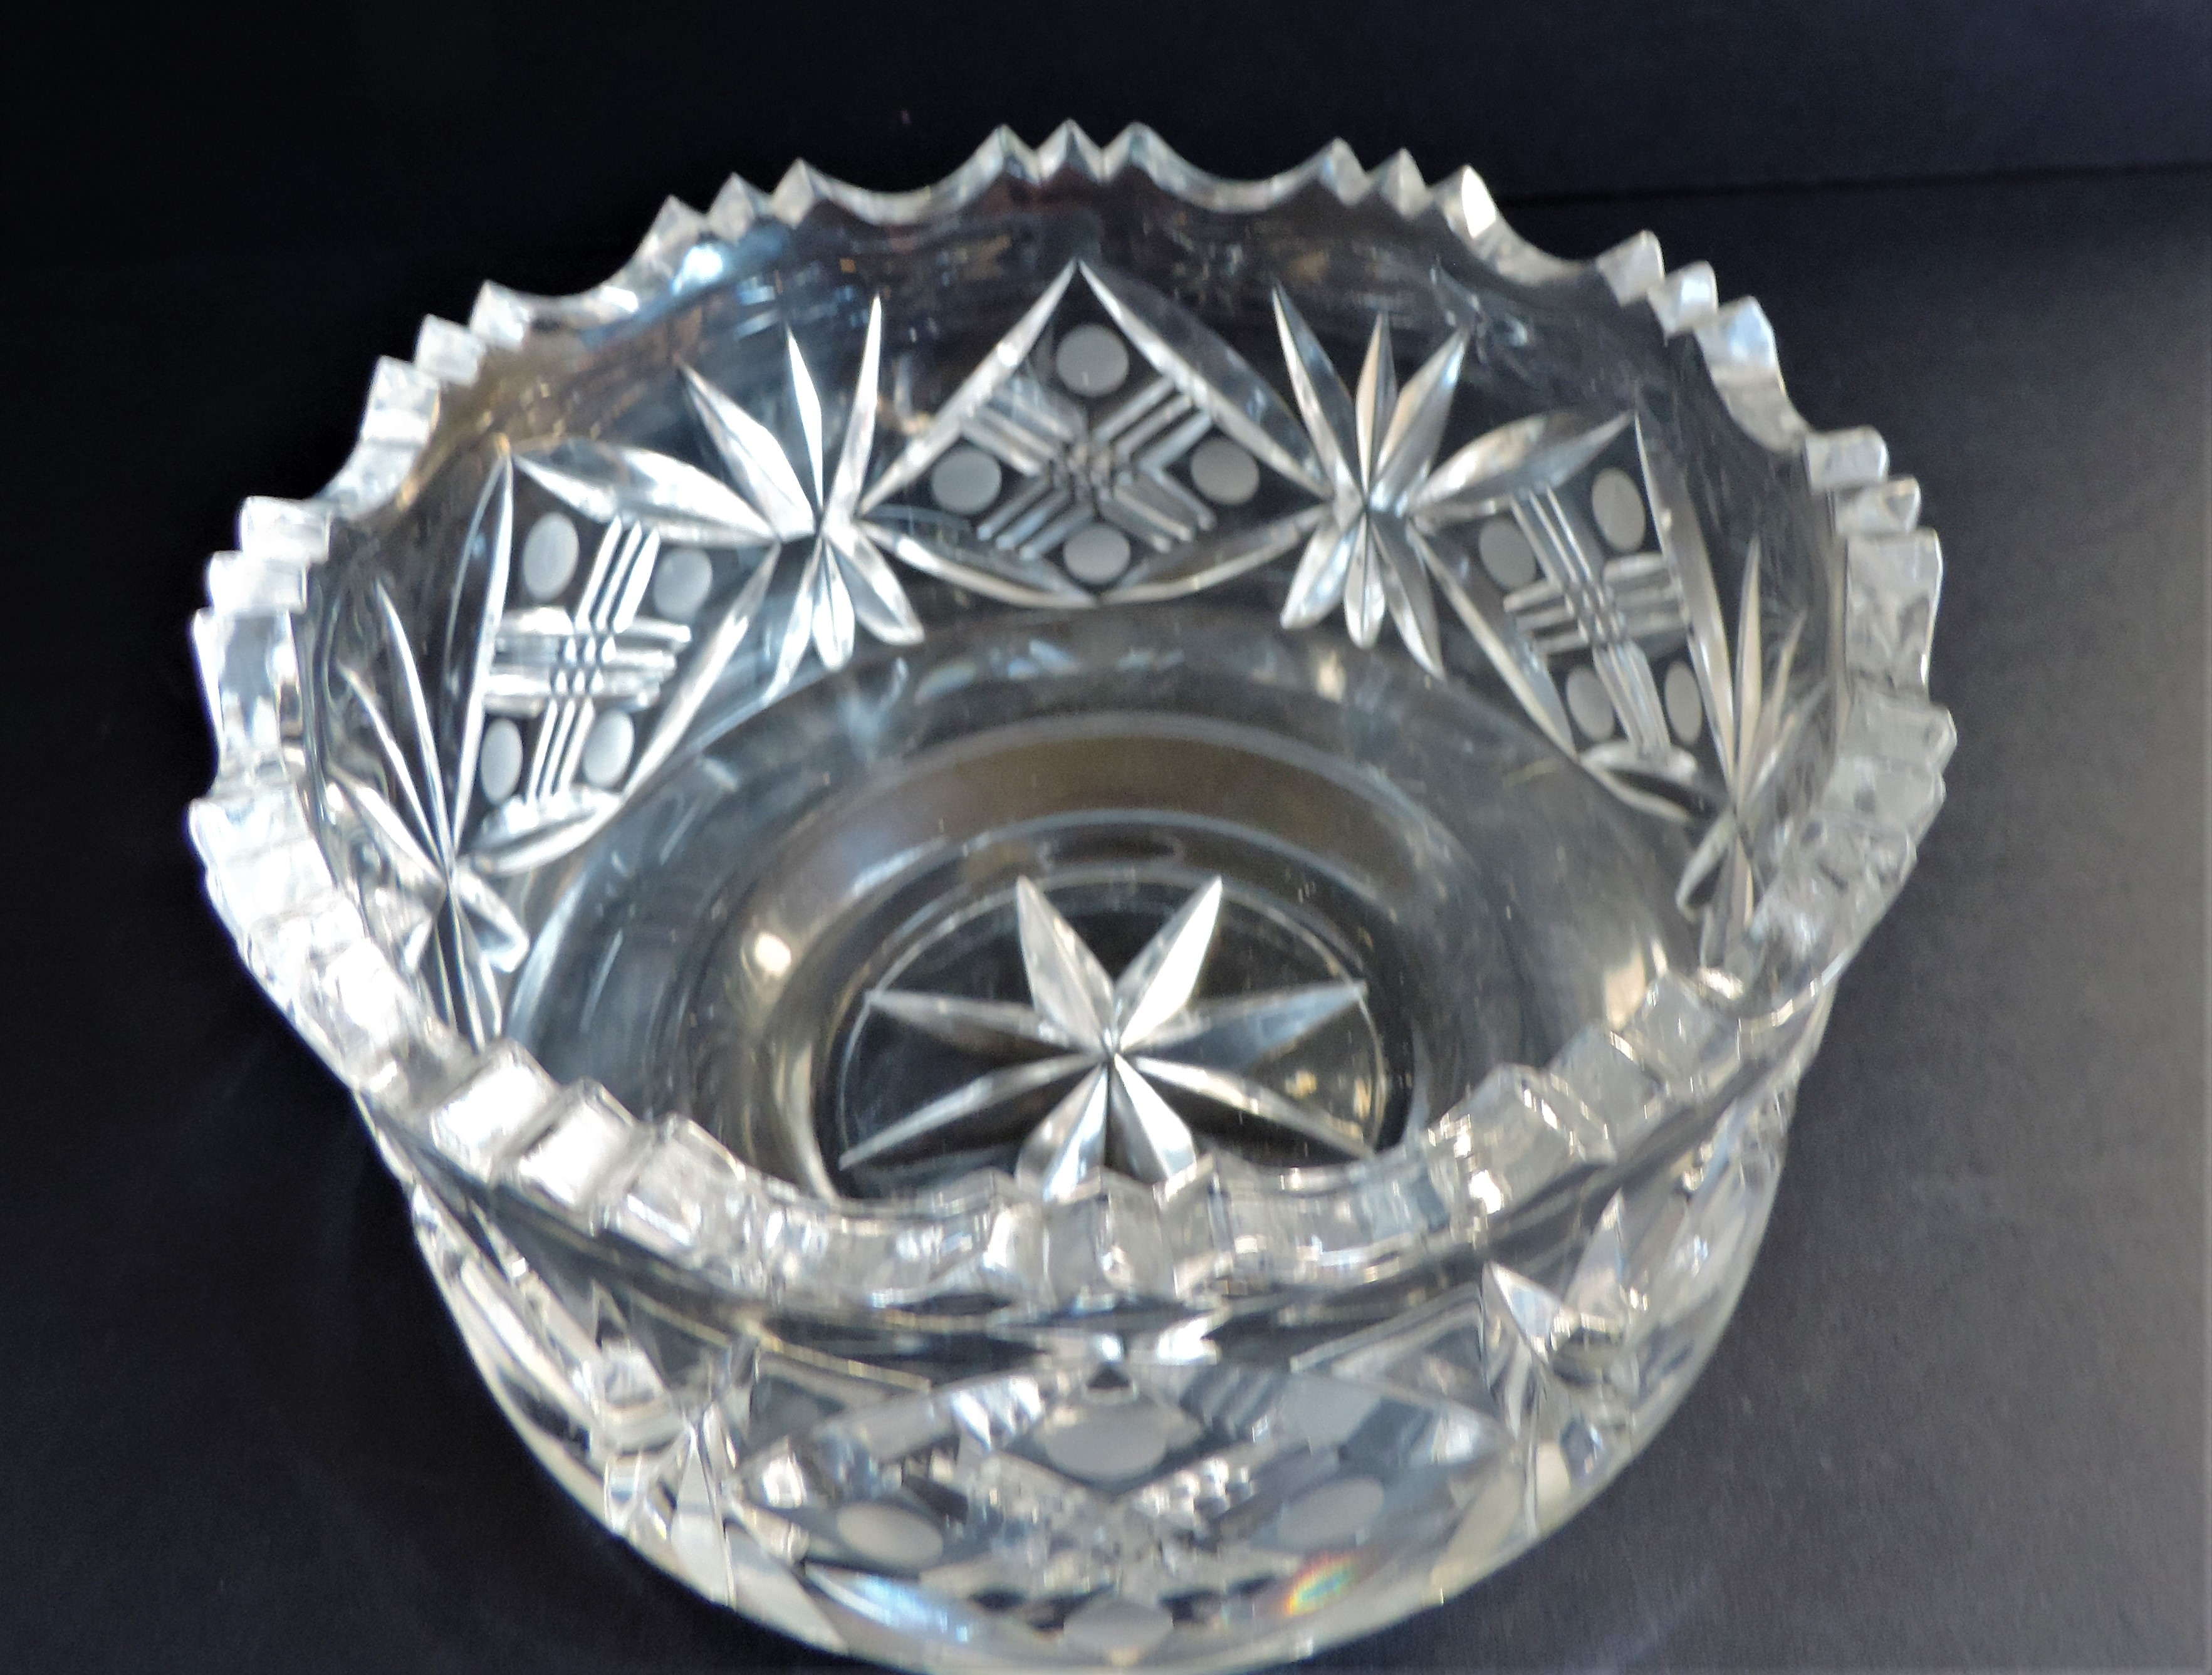 Vintage Bohemian Crystal Bowl - Image 2 of 4